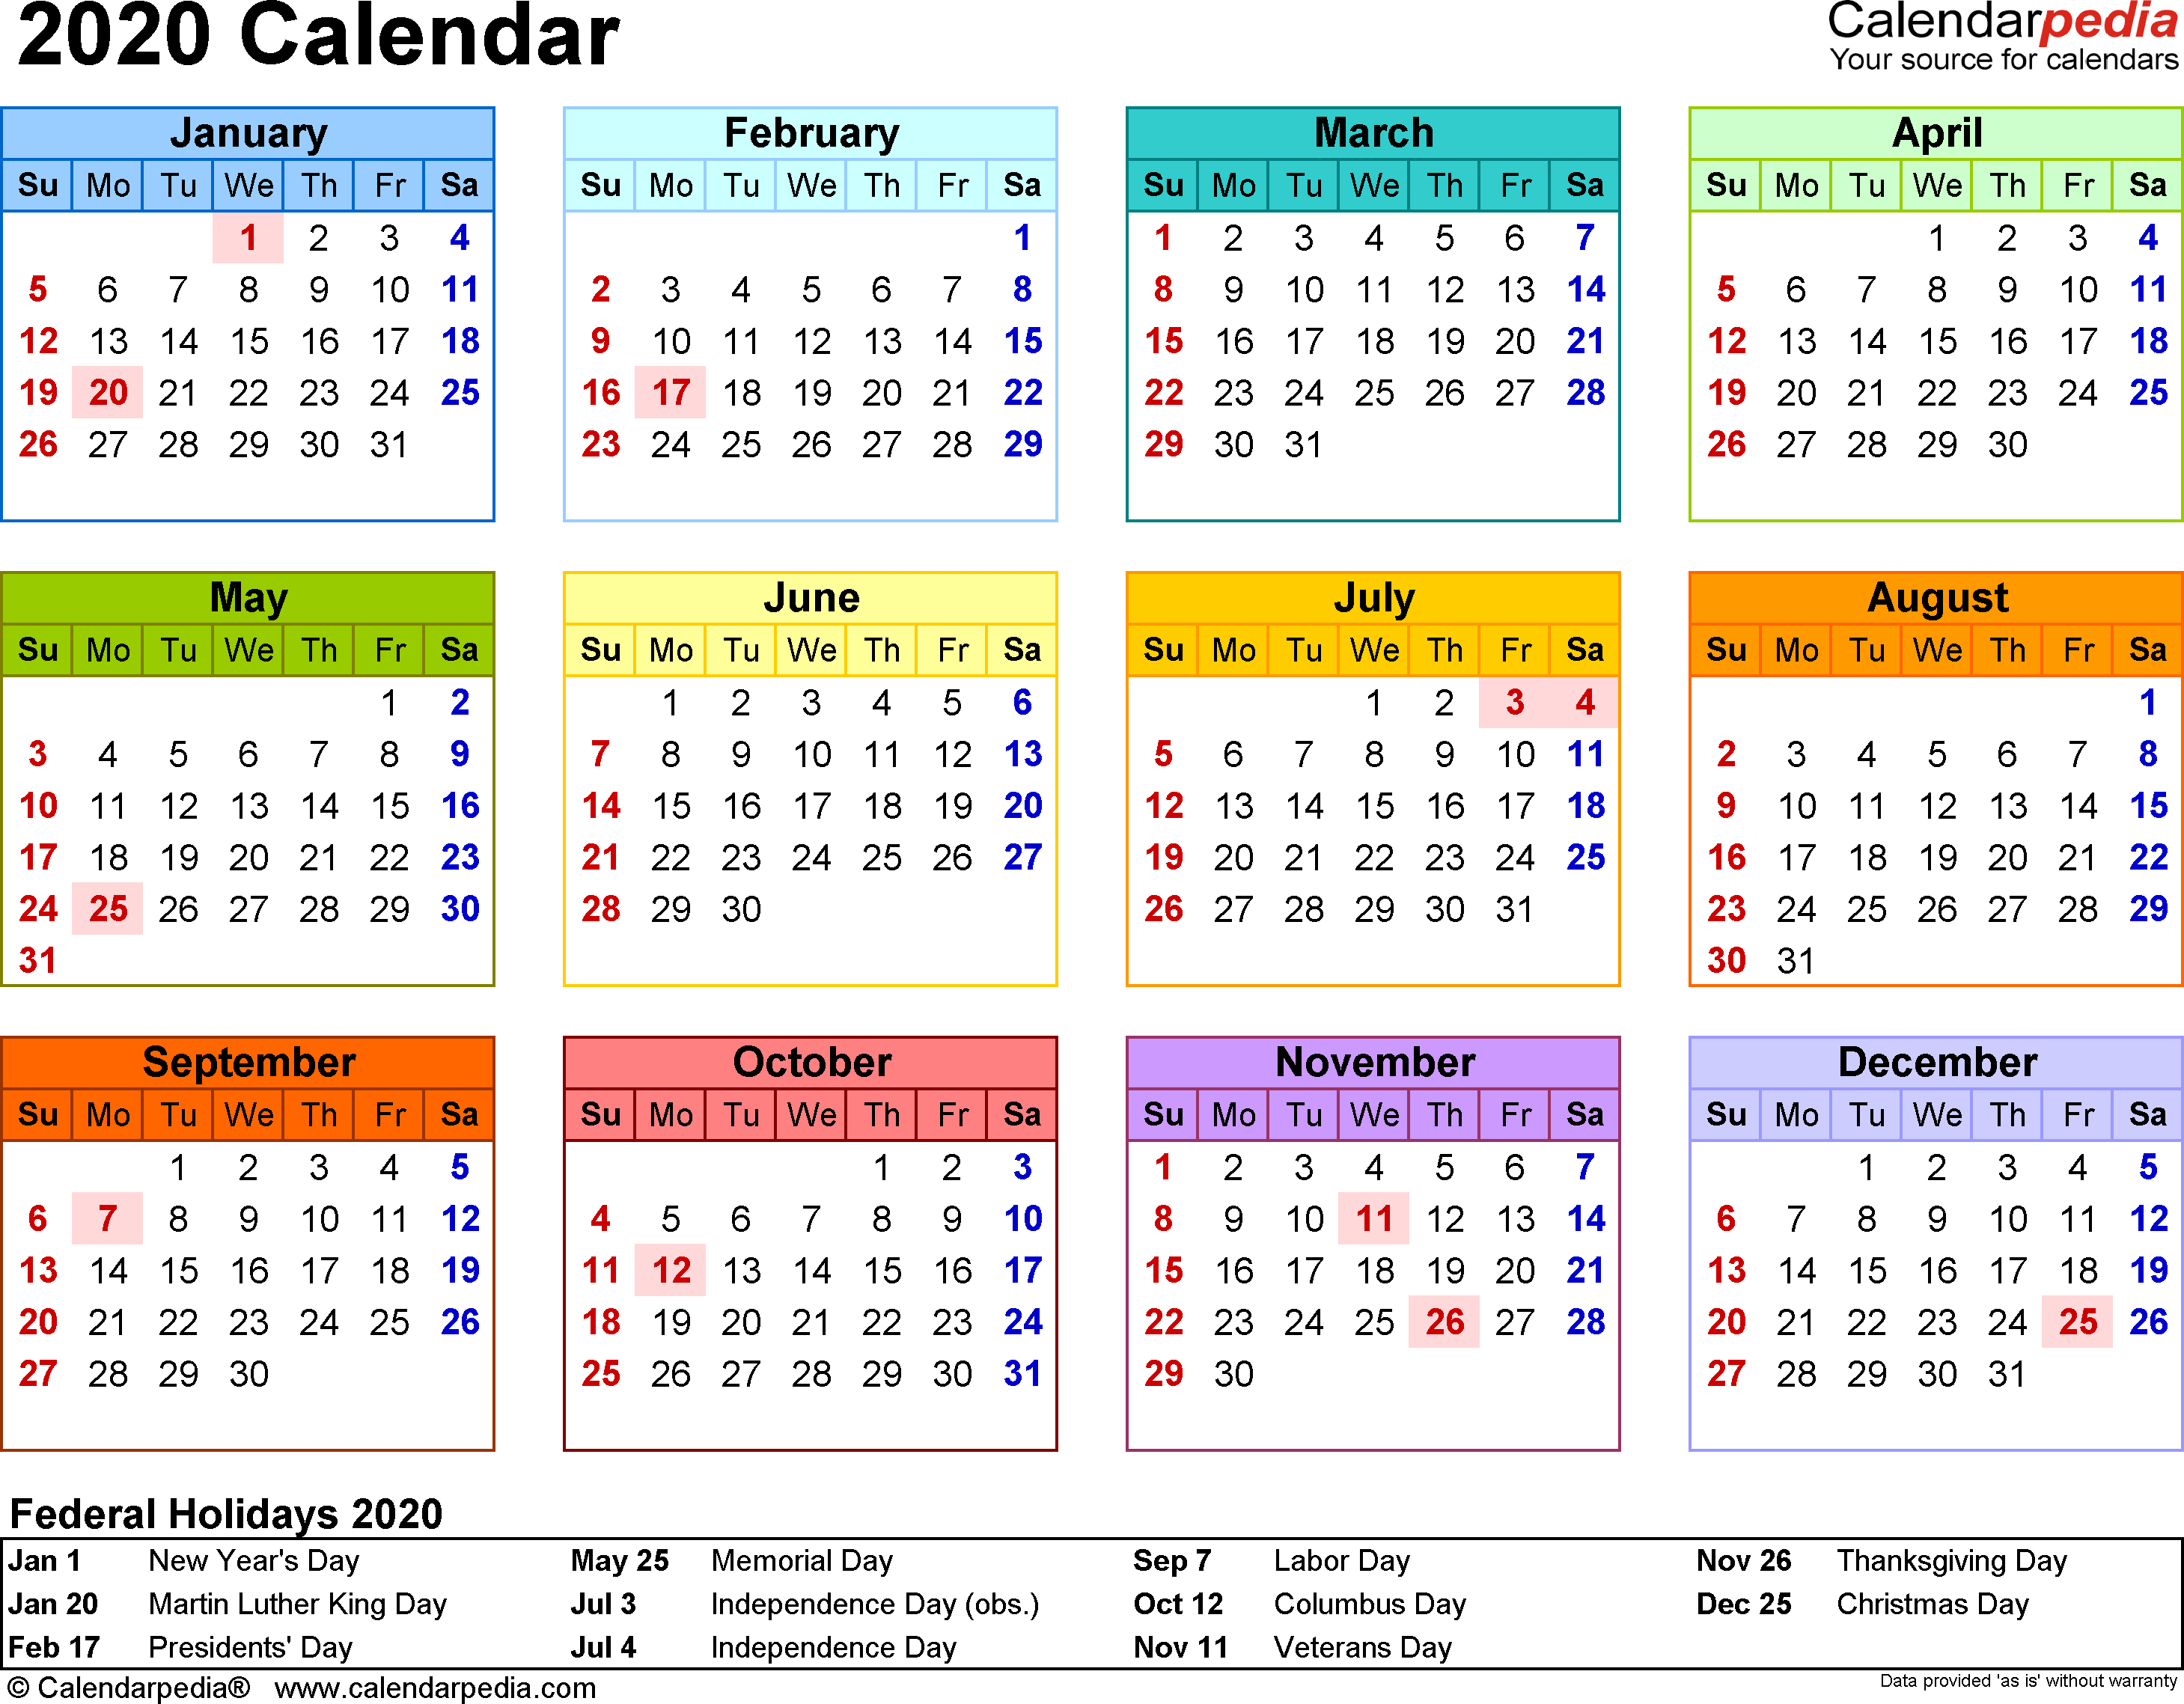 2020 Free Printable Emploee Calendars | Calendar Template